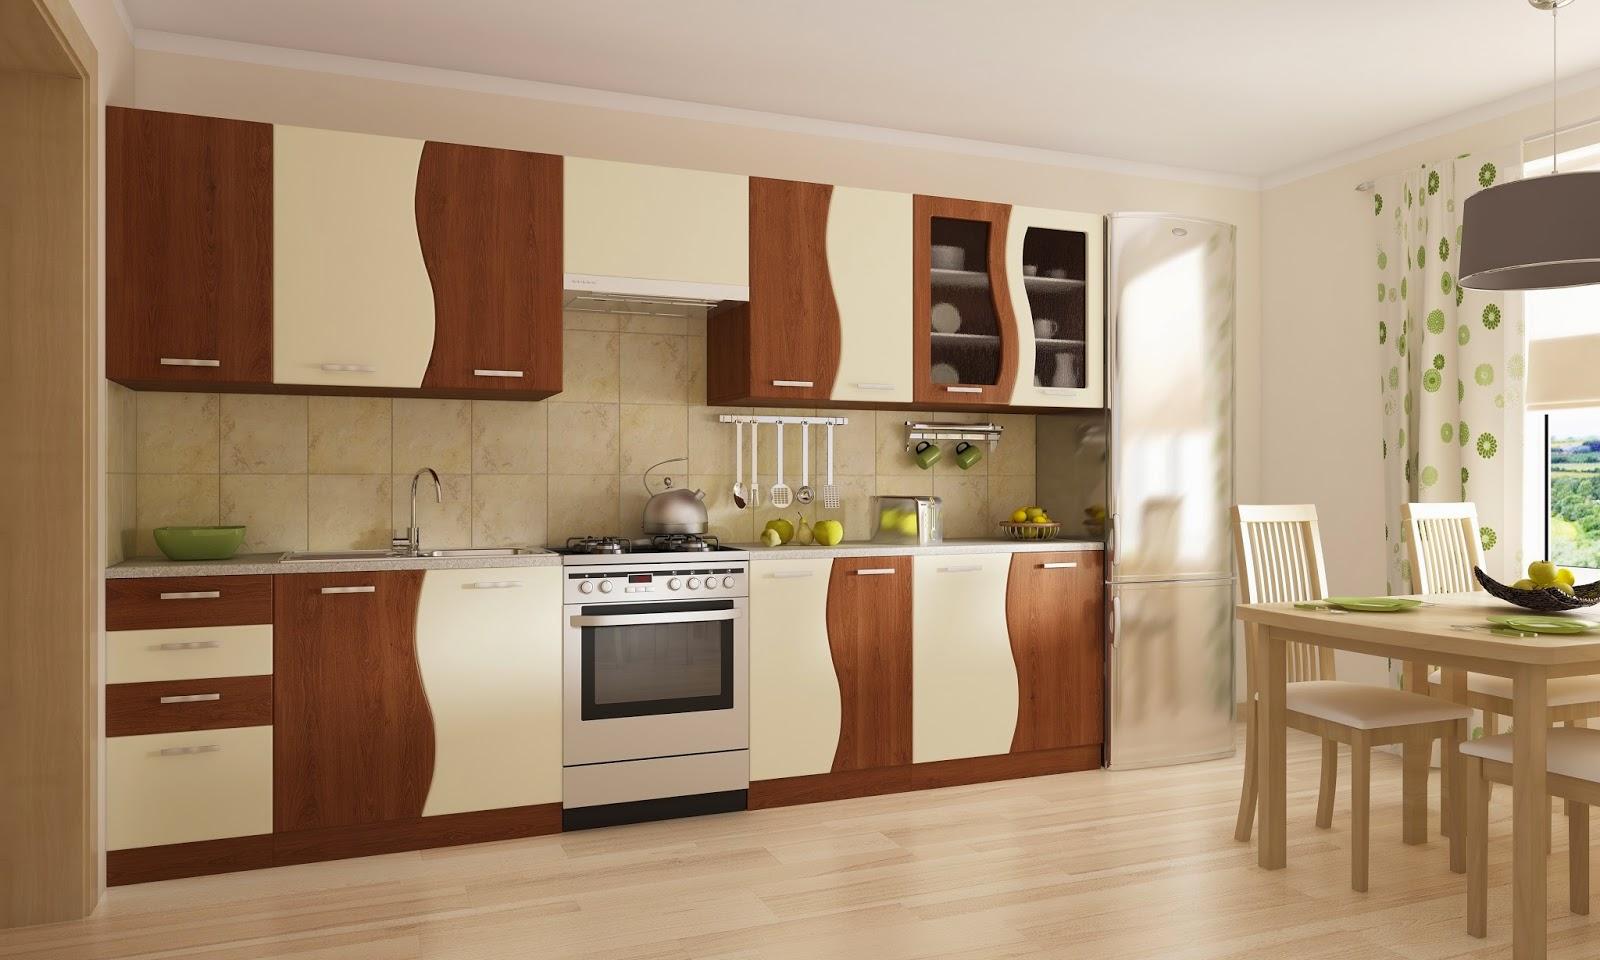 alfabet architekta fronty kuchenne. Black Bedroom Furniture Sets. Home Design Ideas